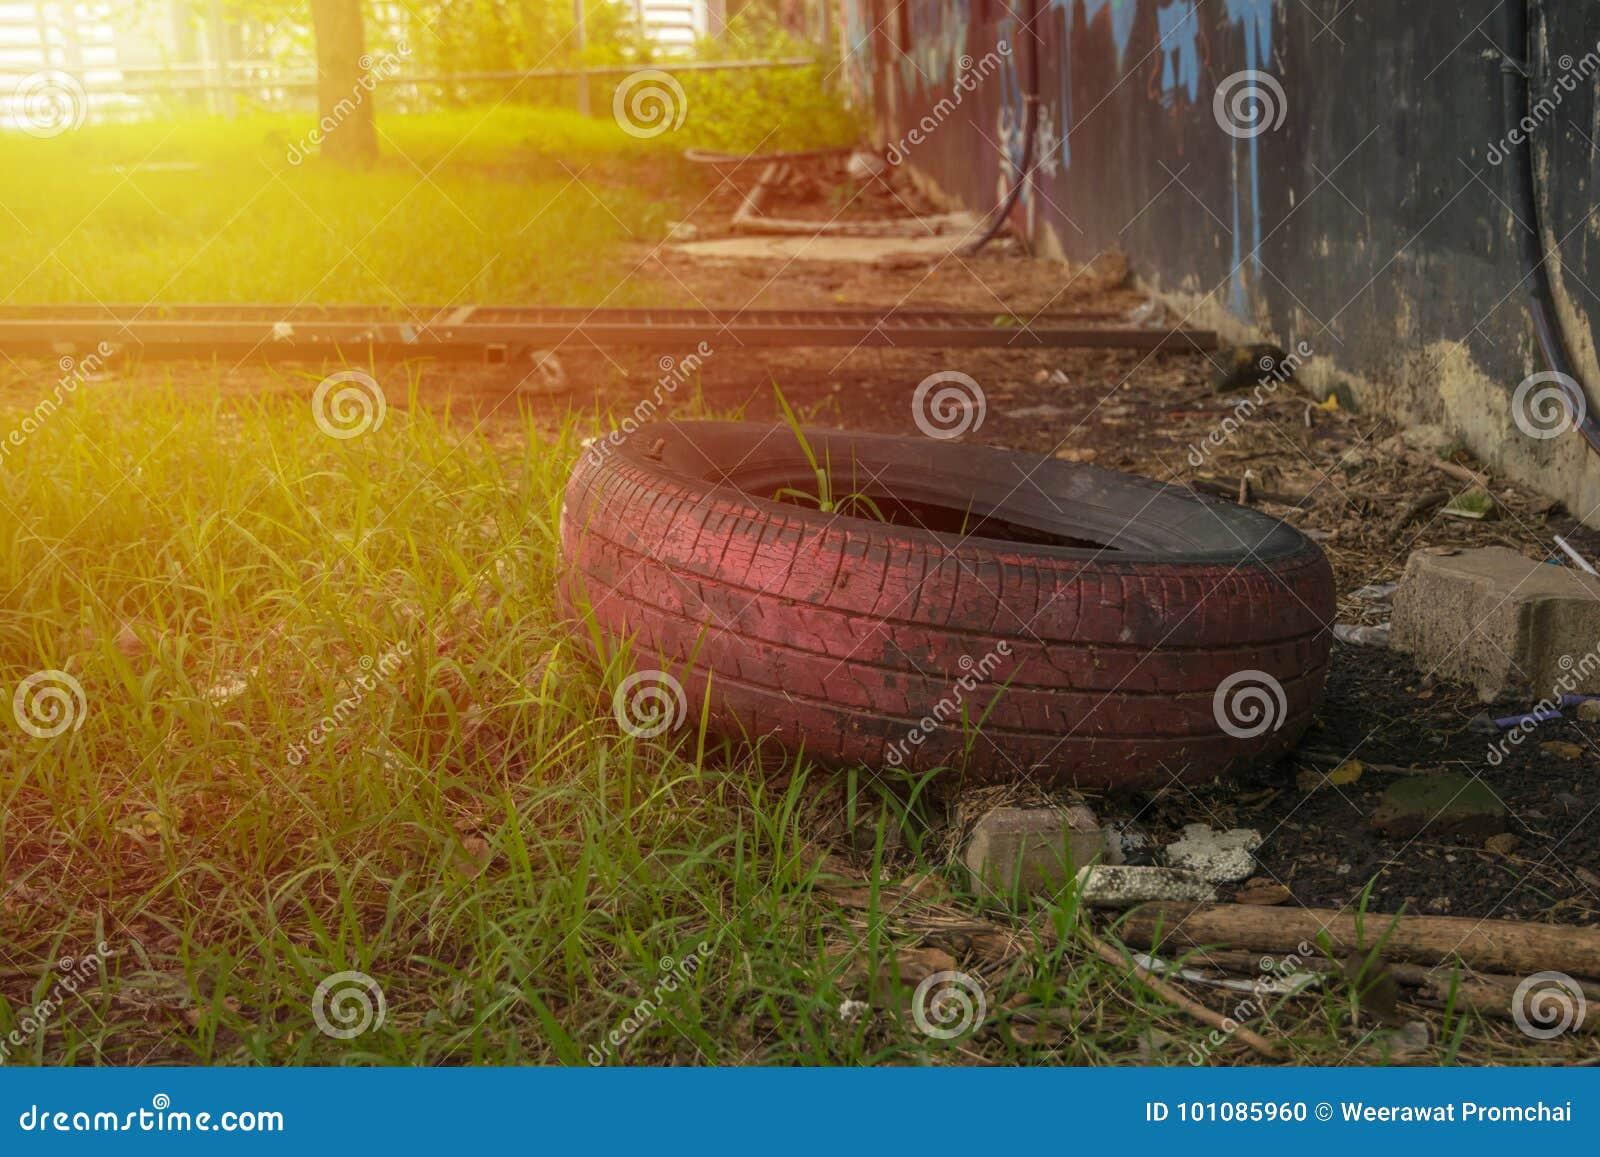 Unusable tire